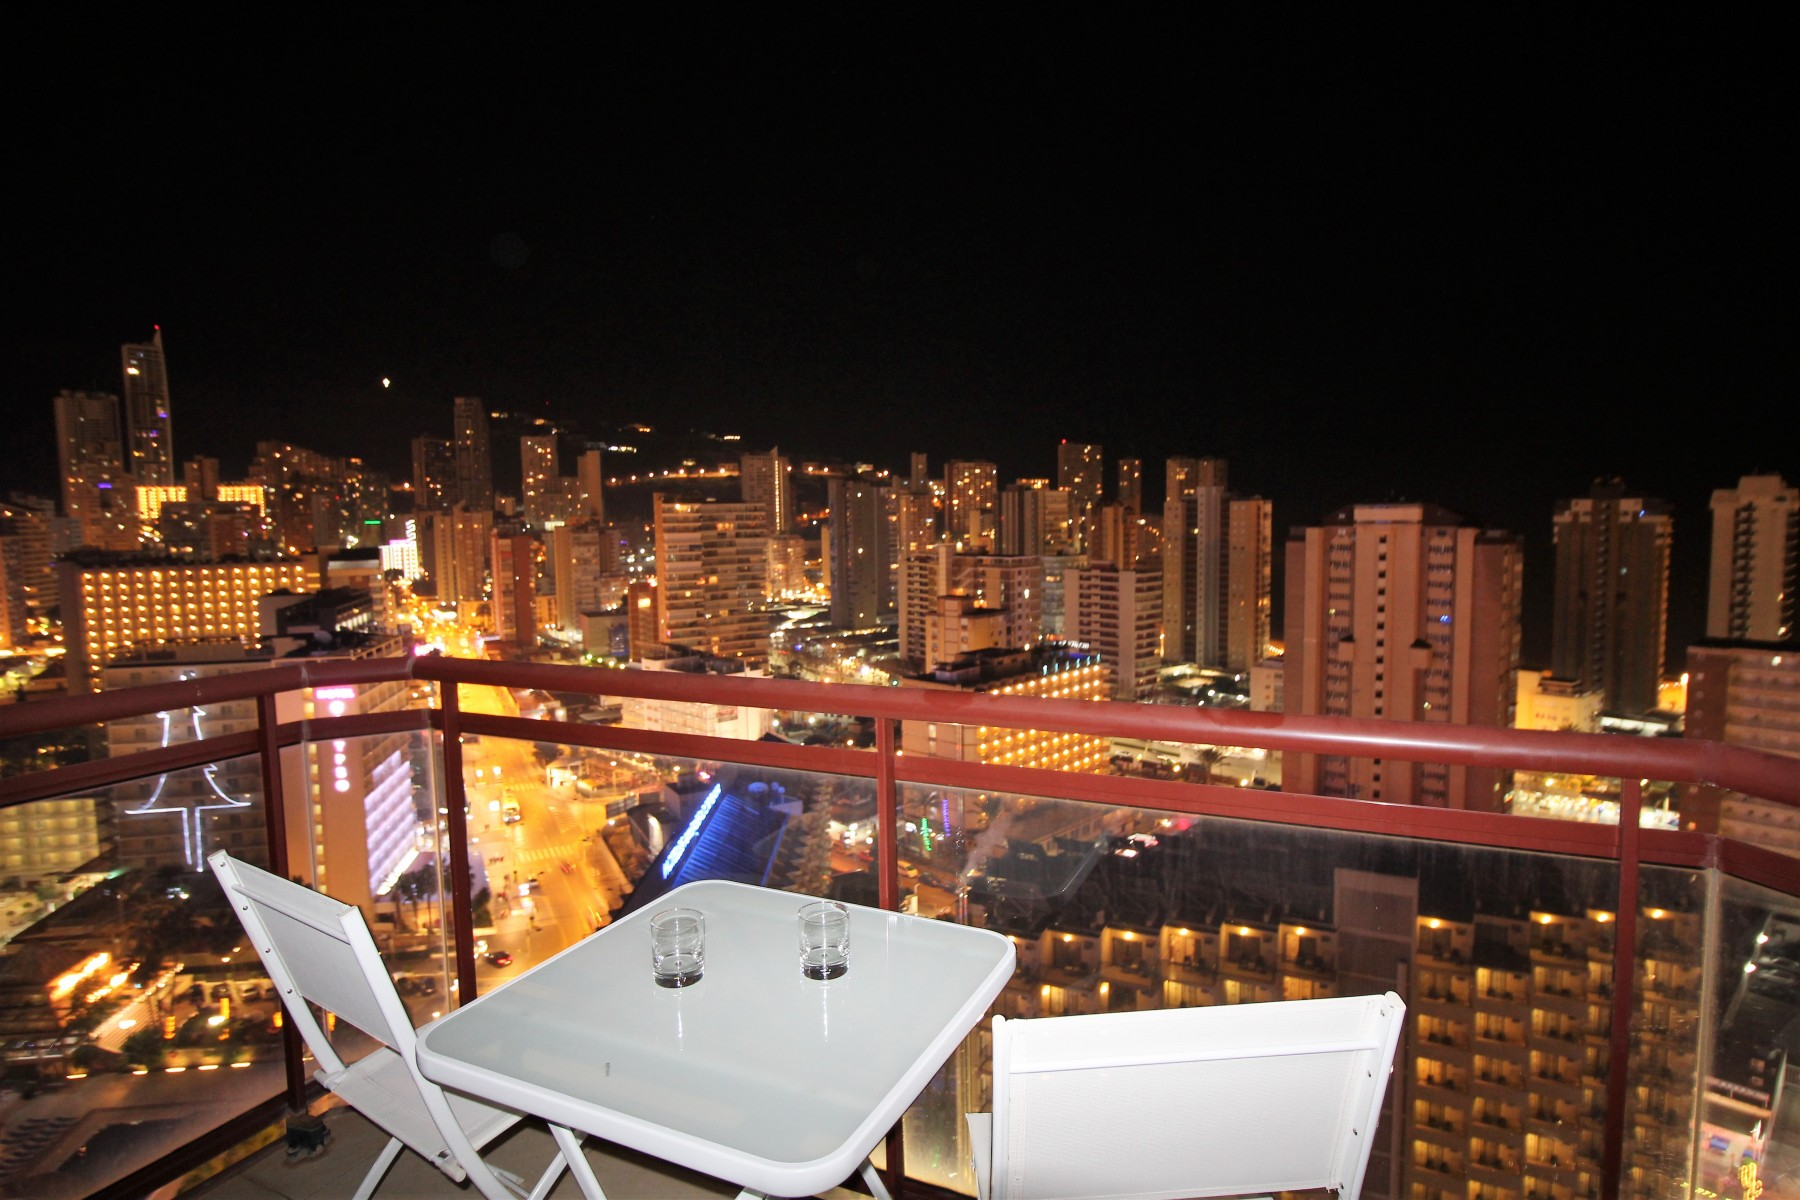 Torre Mar 20-D - Apartments in Benidorm